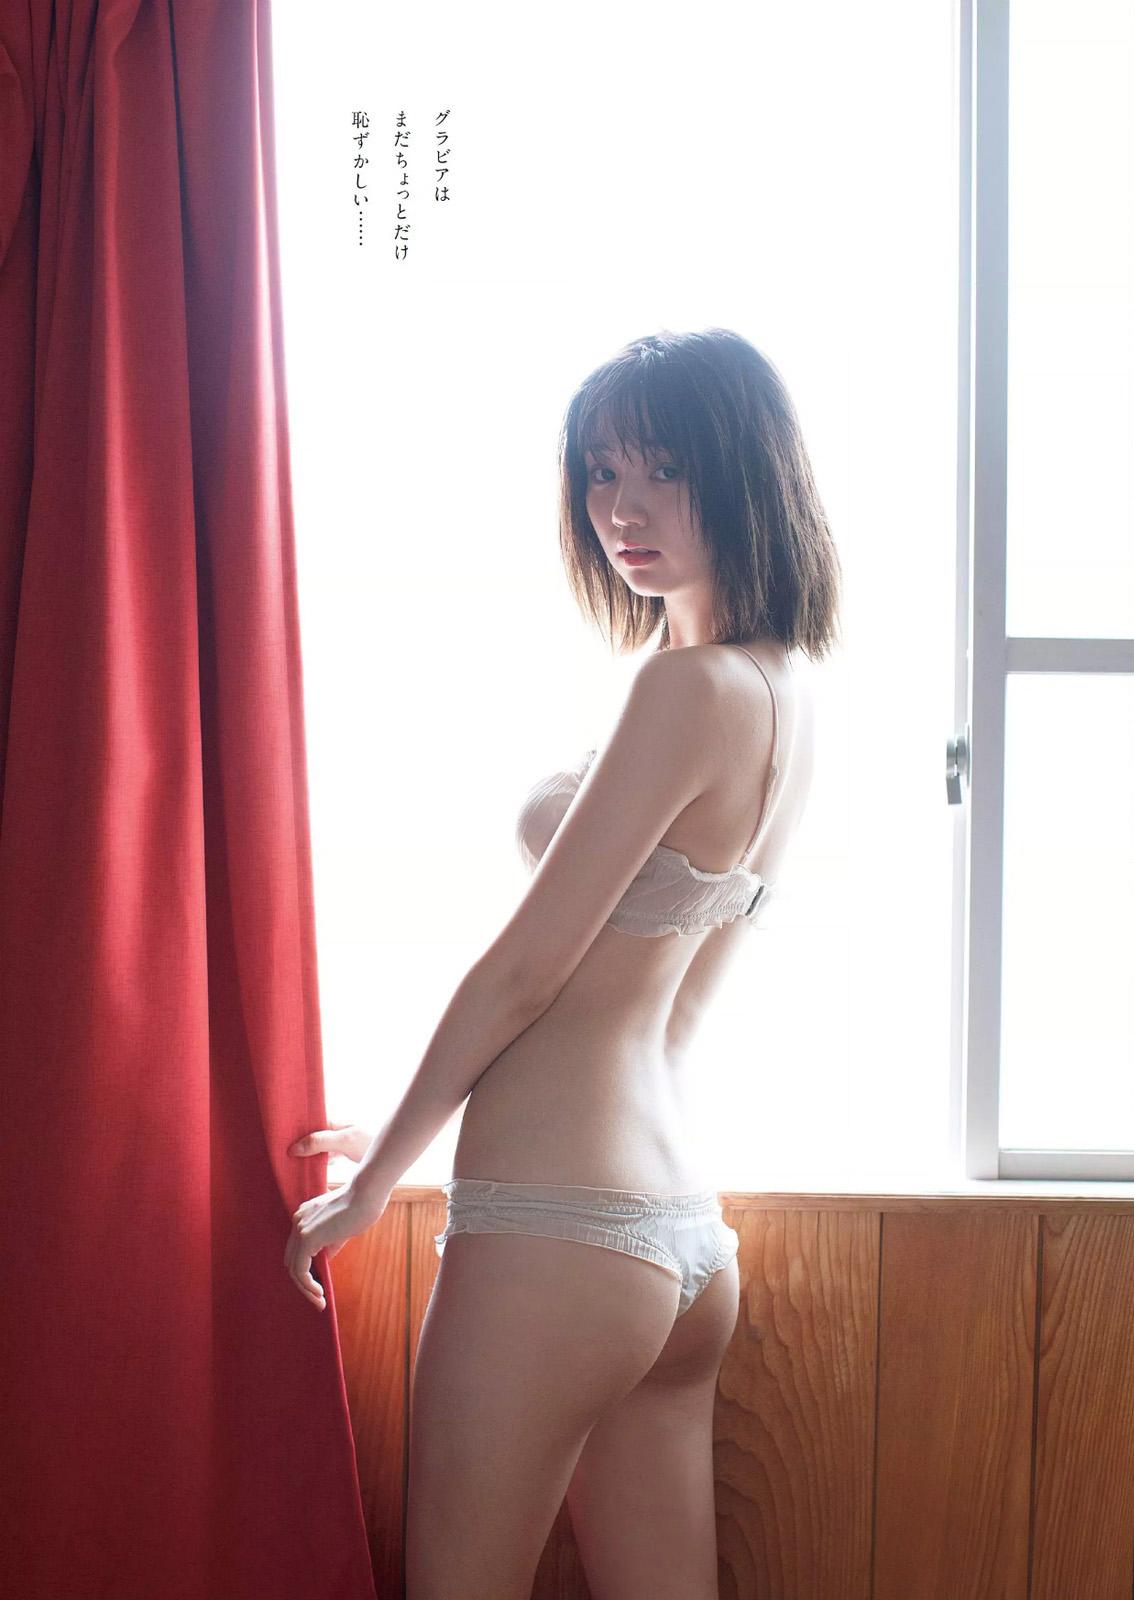 Manami Enosawa 江野沢愛美, Weekly Playboy 2017 No.42 (週刊プレイボーイ 2017年42号)